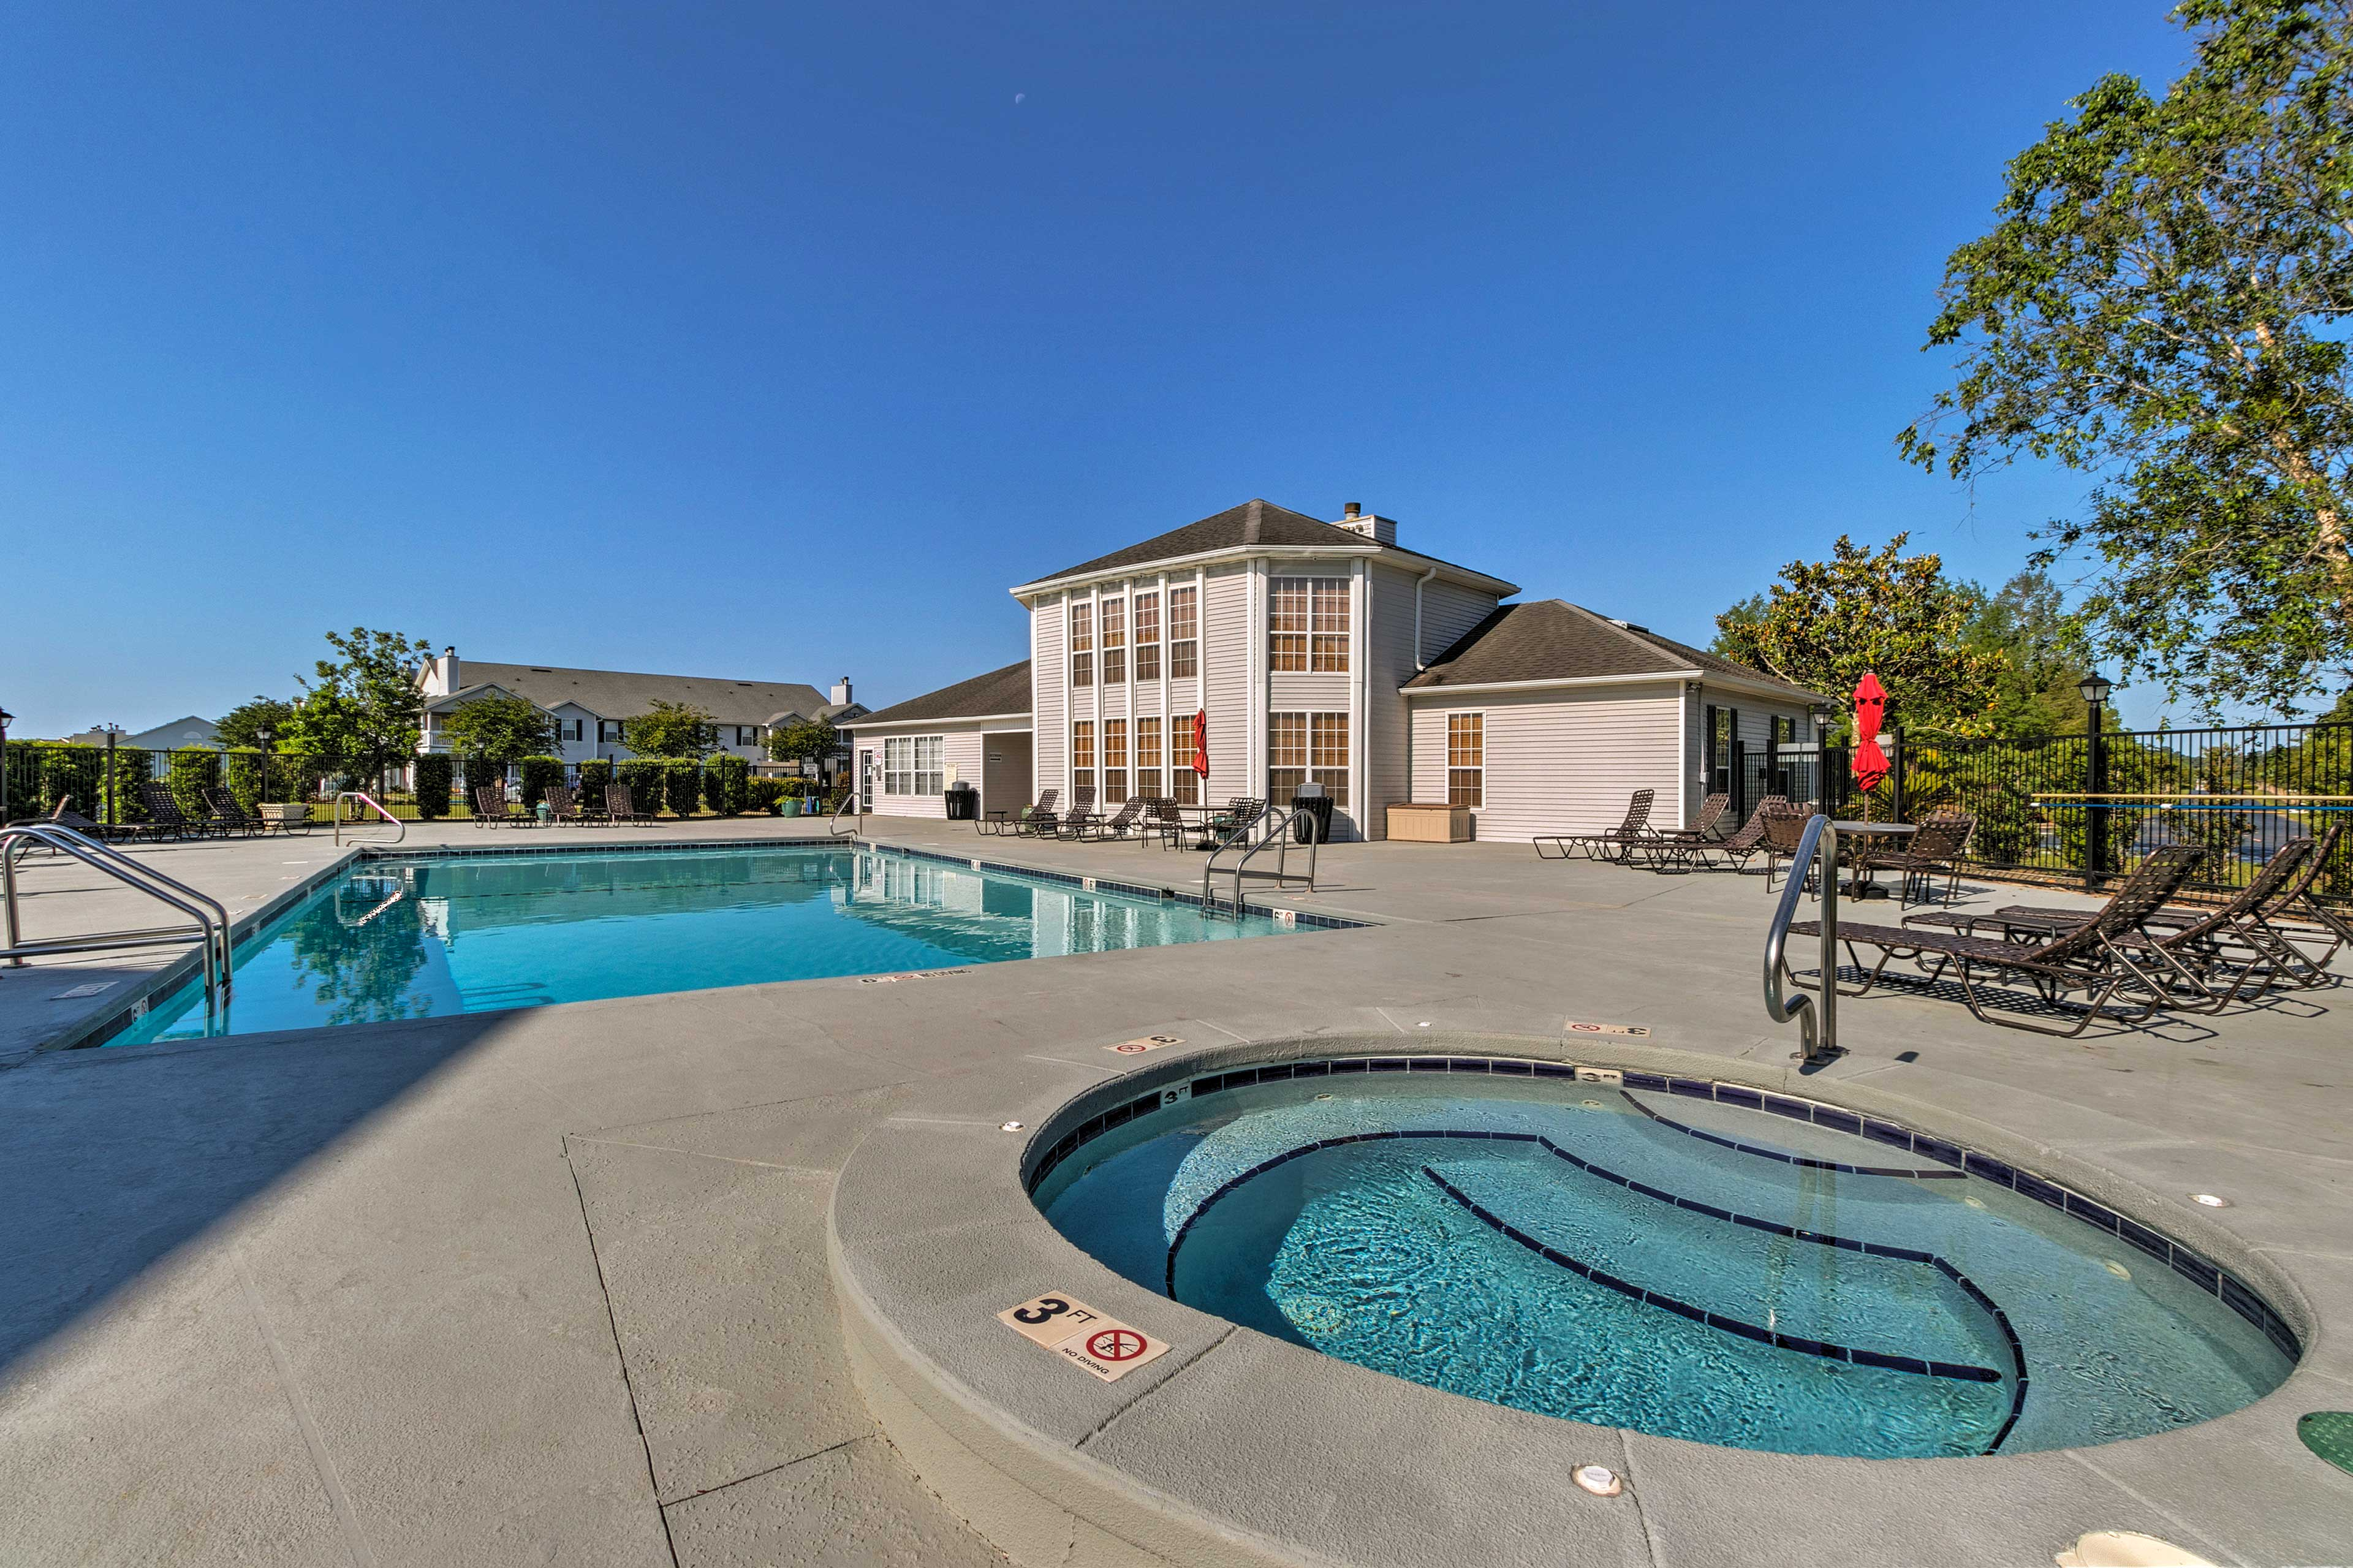 Book your Gulf Shores retreat to this 2-bedroom, 2-bath vacation rental condo!